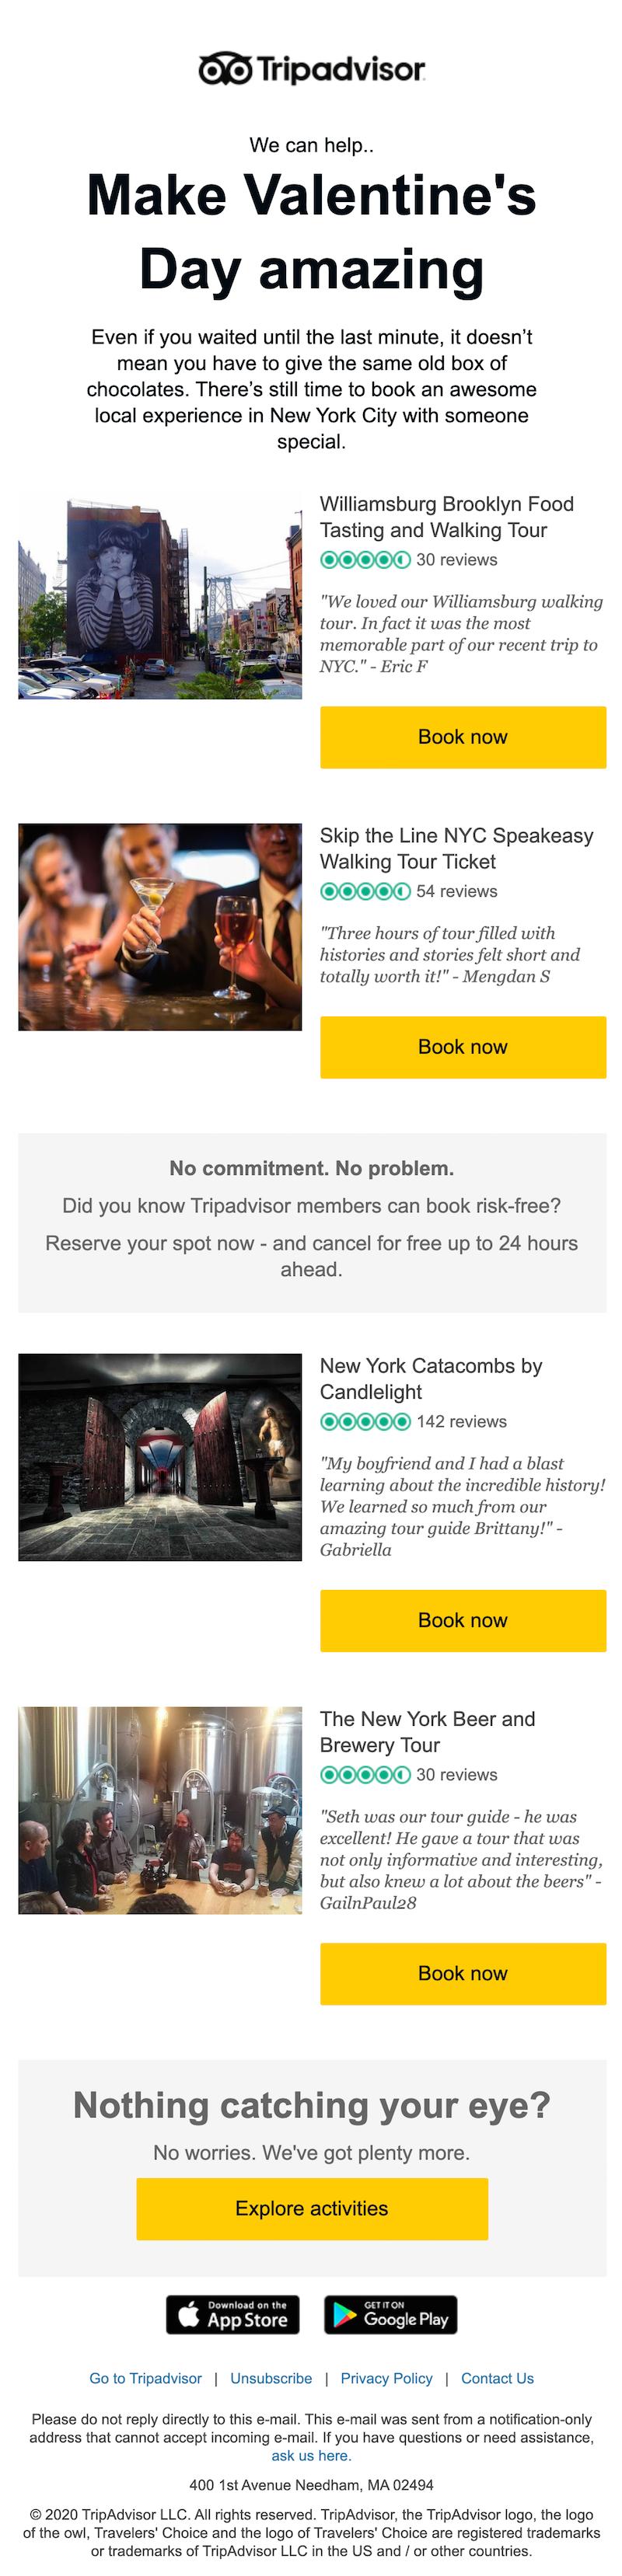 valentine's day email marketing